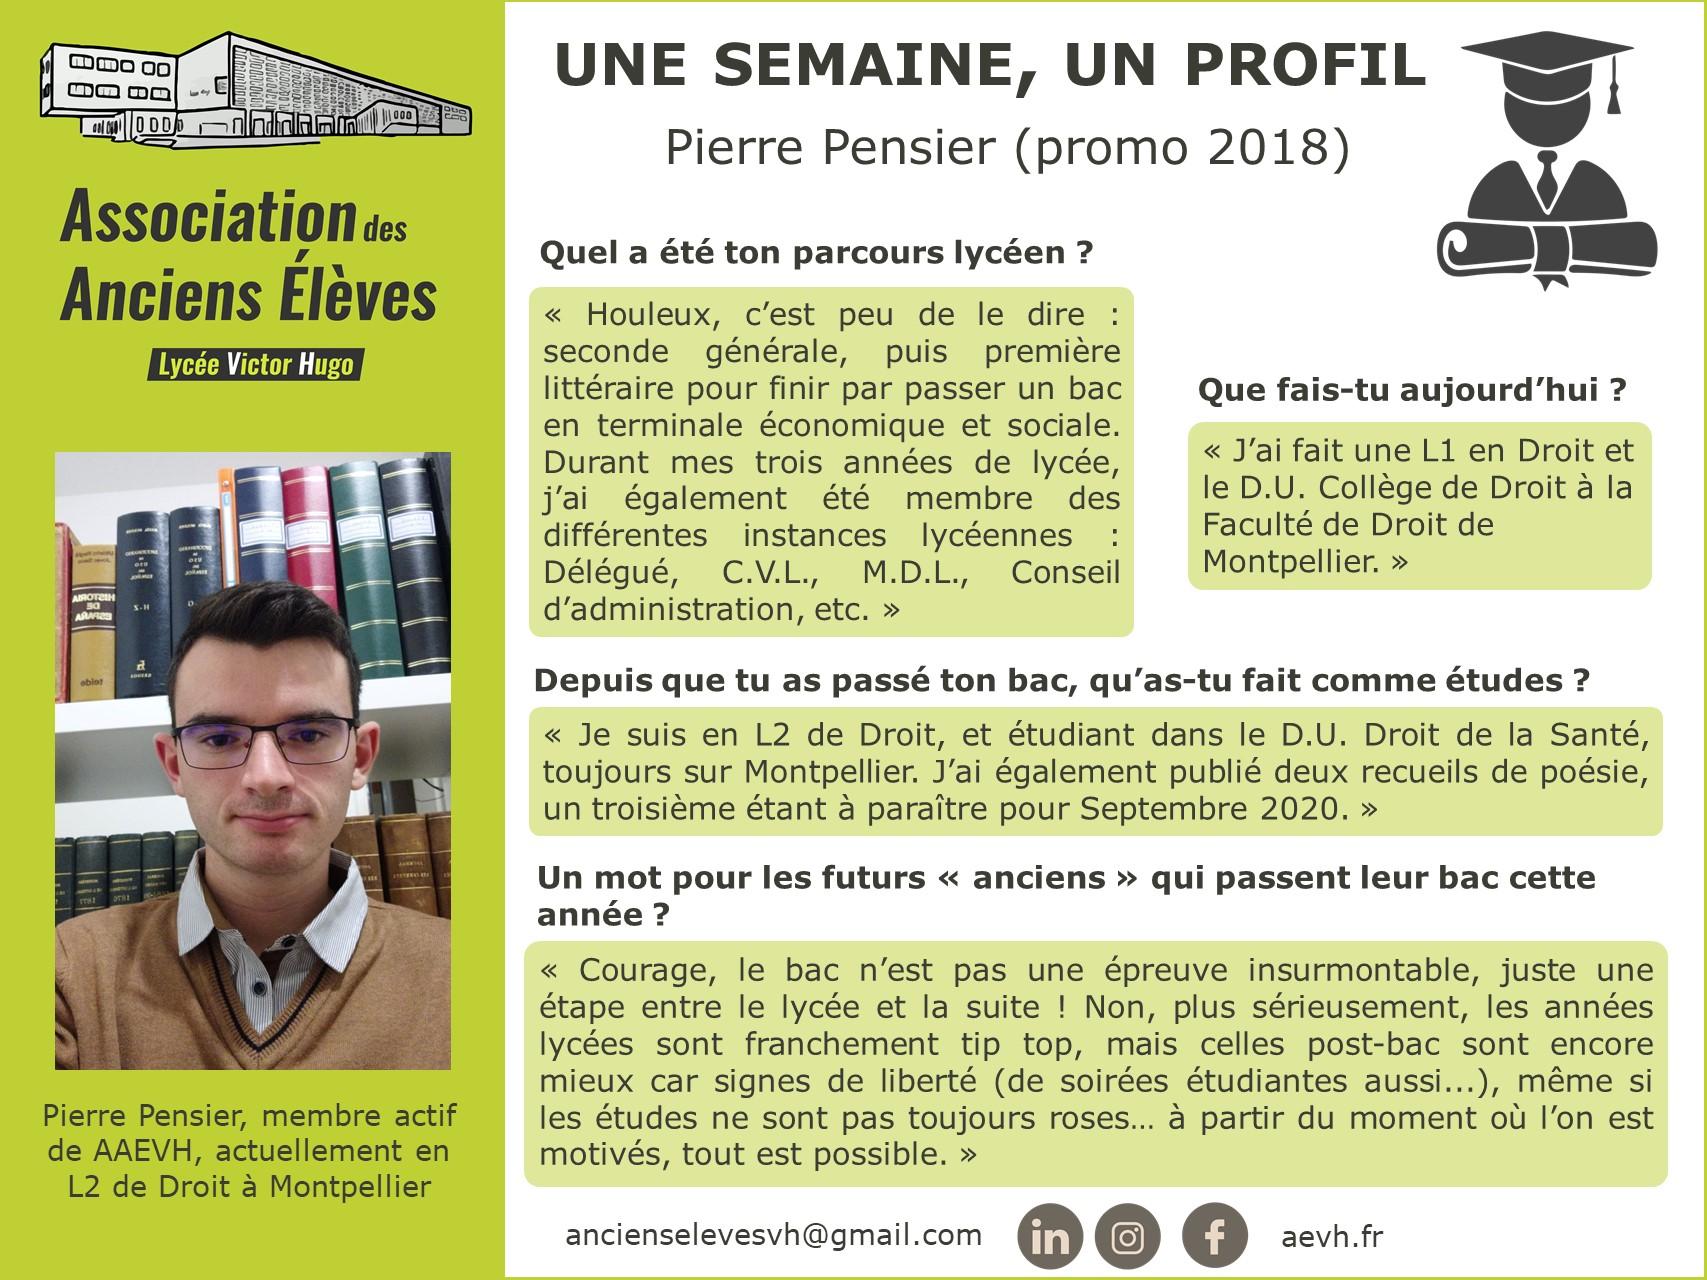 Profil_pierre_pensier